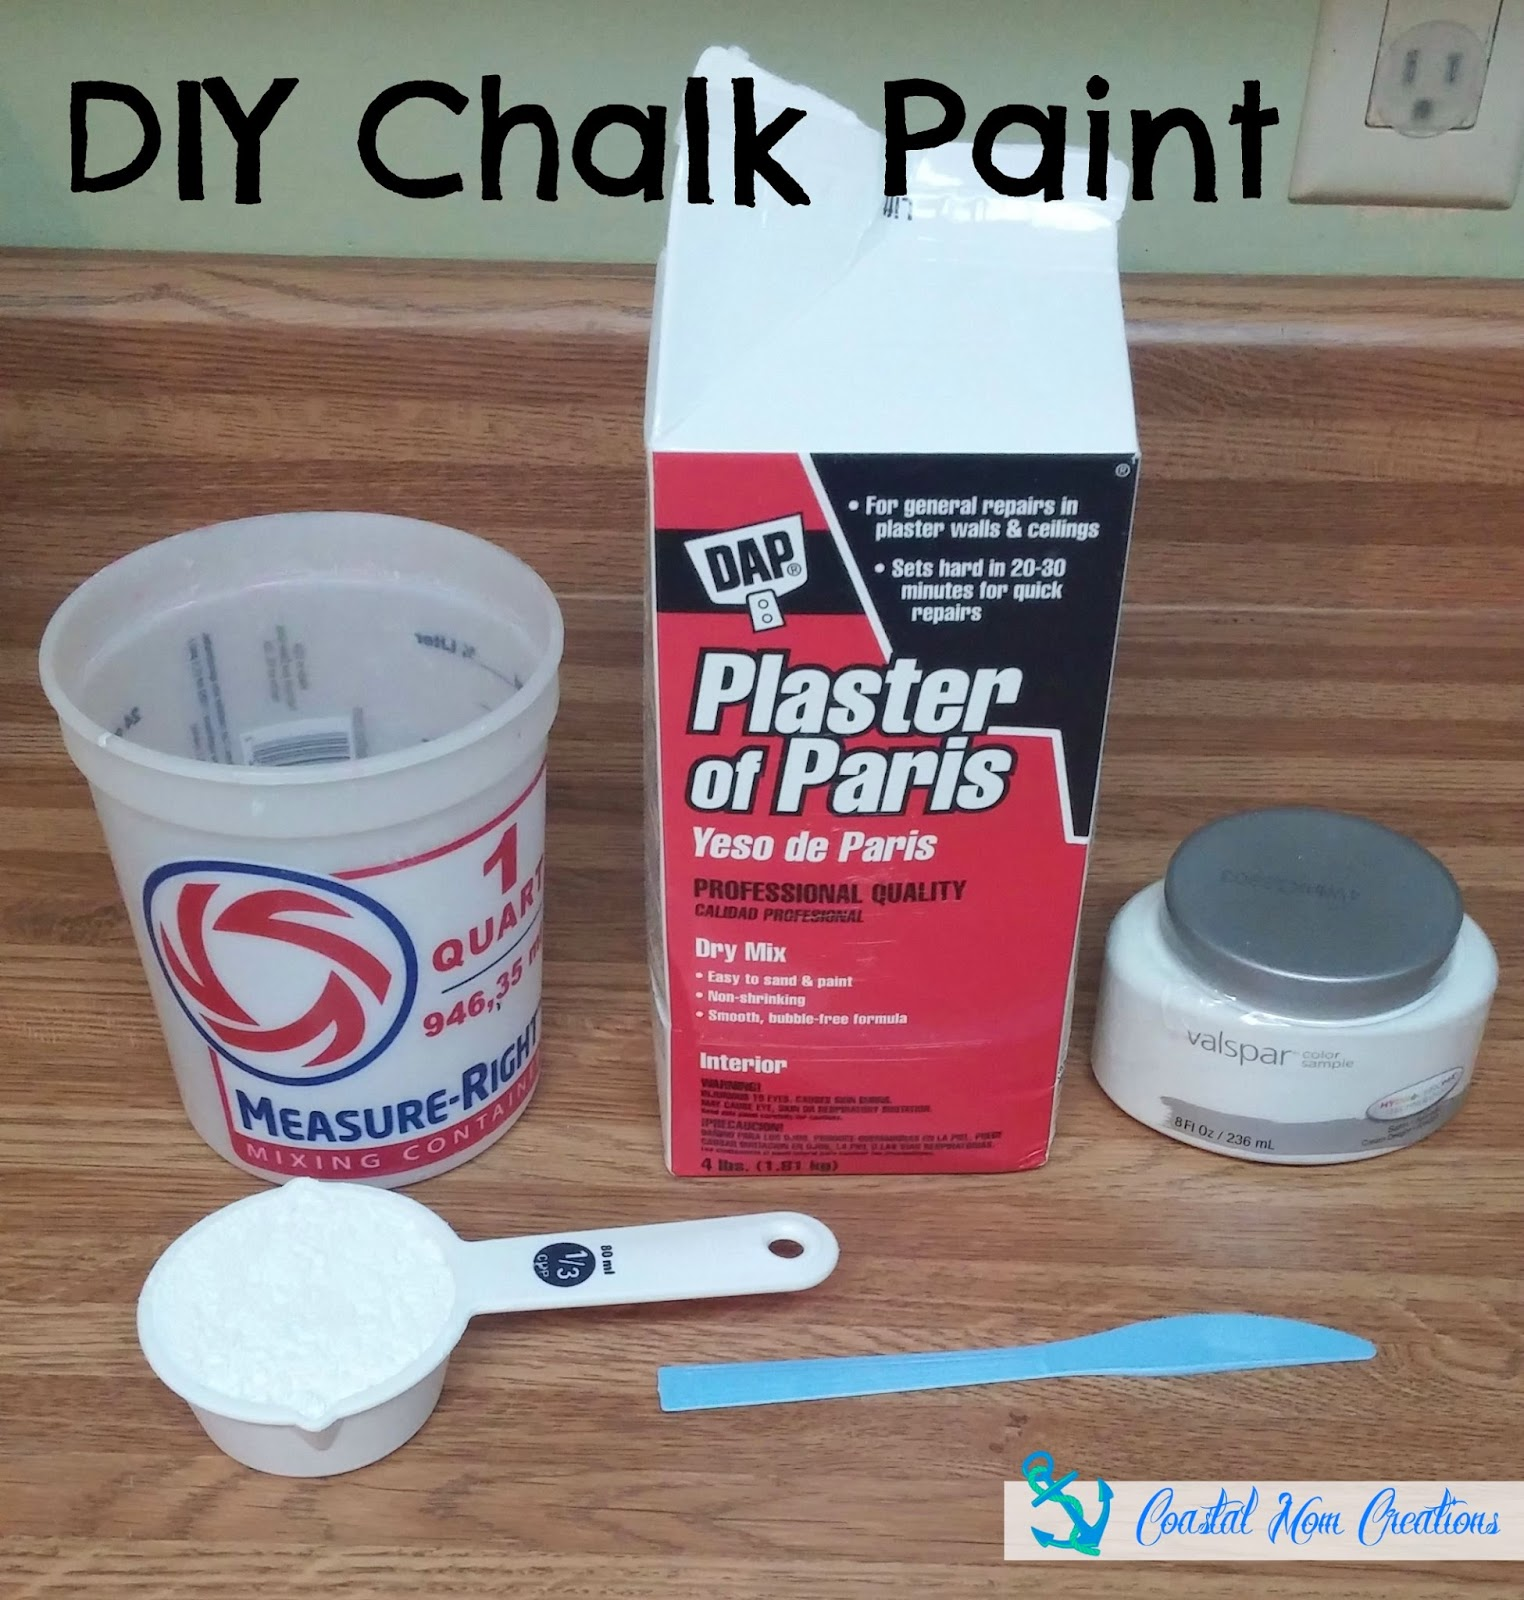 Coastal Mom Creations April - Plaster of paris chalk paint